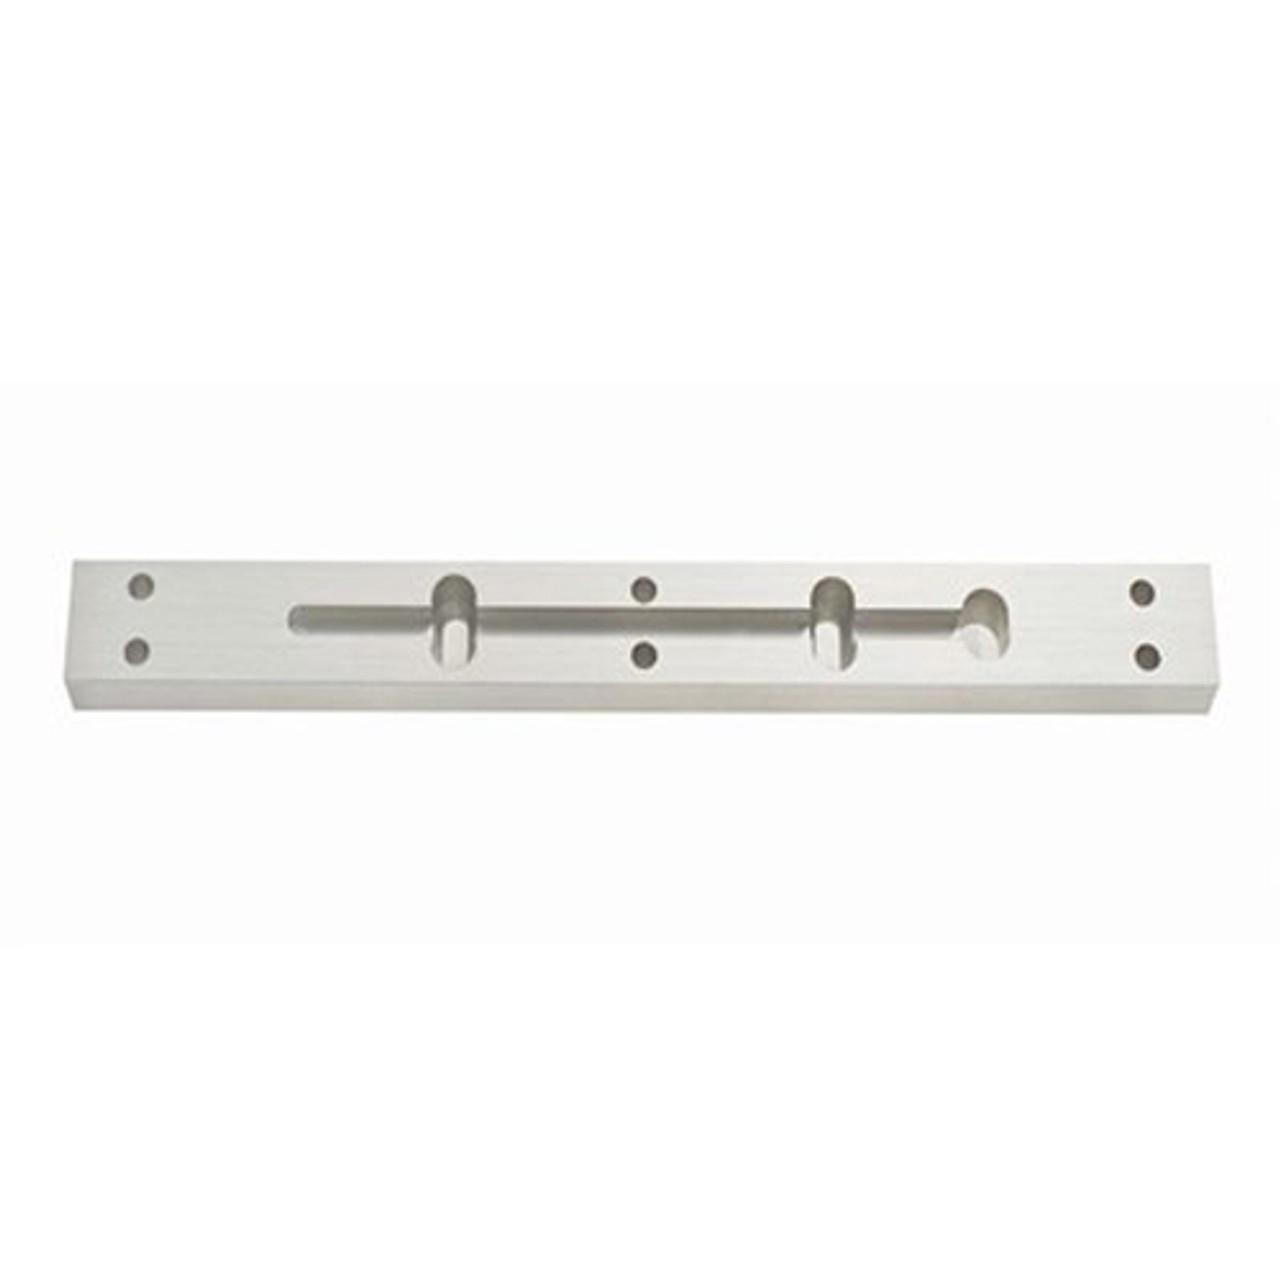 ASP-AM3305 ASP Alarm Control Mounting Brackets For Magnetic Locks